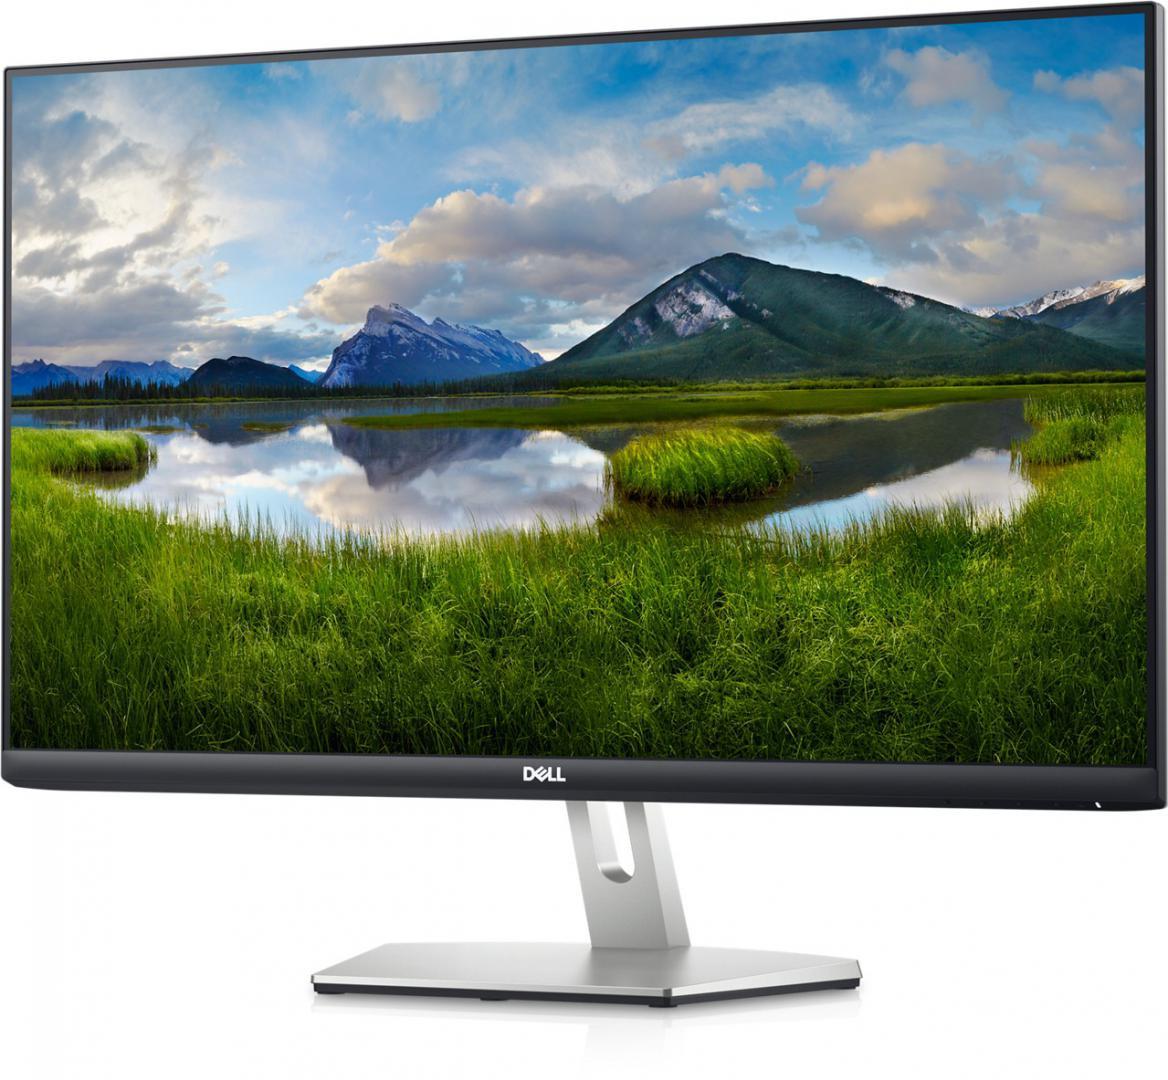 Monitor Dell 27'' S2721HN, 68.6 cm, LED, IPS, FHD, 1920 x 1080 at 75Hz, 16:9 - imaginea 3